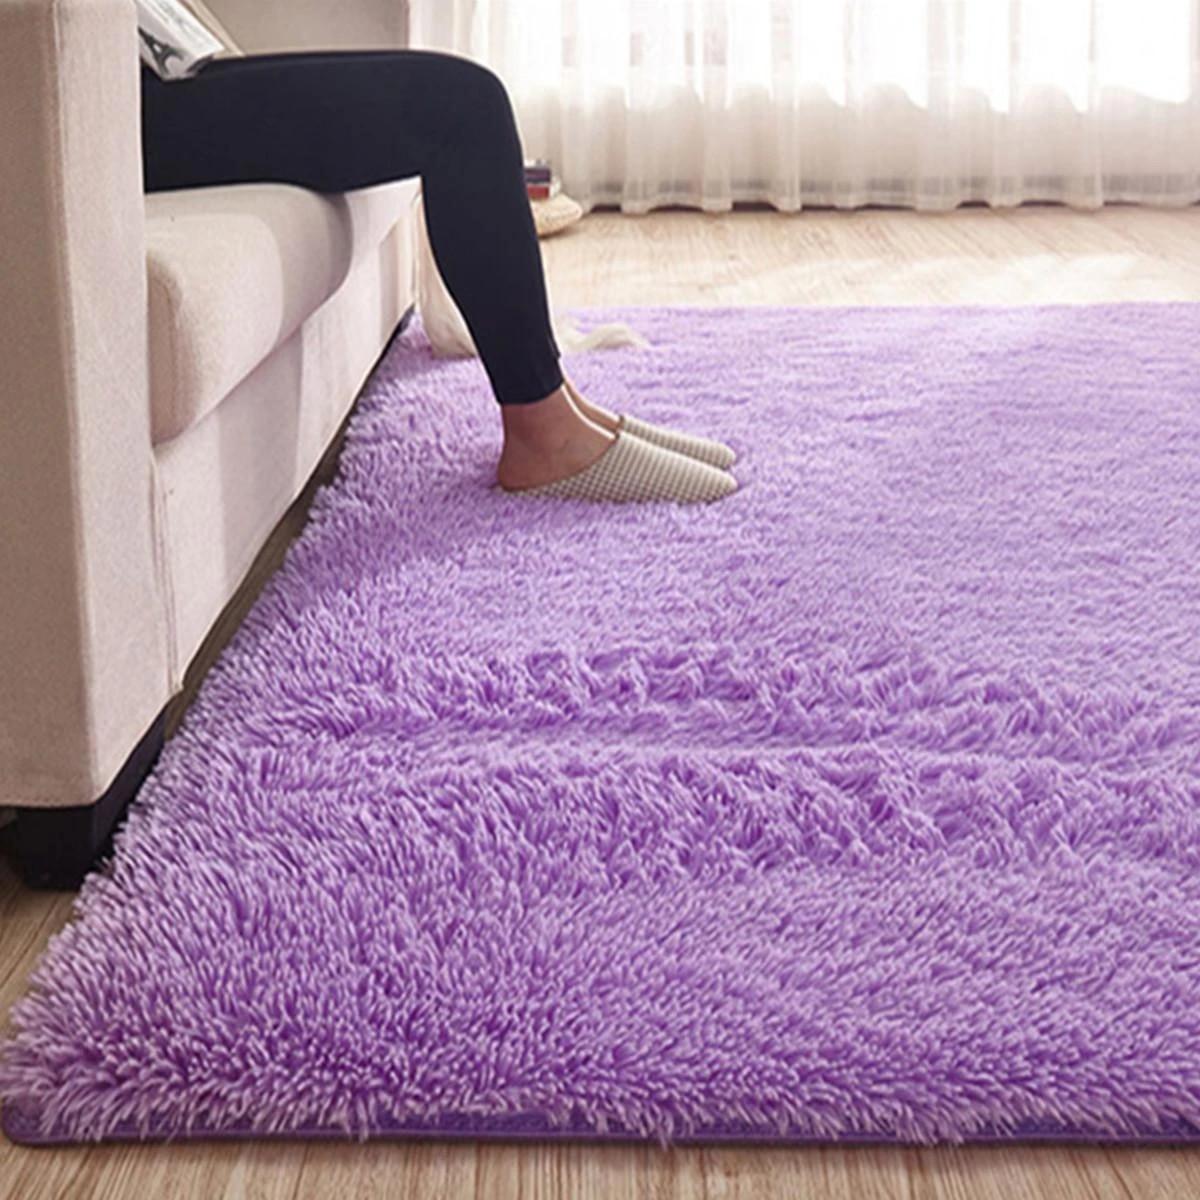 Purple Fluffy Rugs Anti Skid Shaggy Area Rug Non Slip Carpet Floor Mat Home Living Room Soft Child Bedroom Climbing Mat Carpet Aliexpress